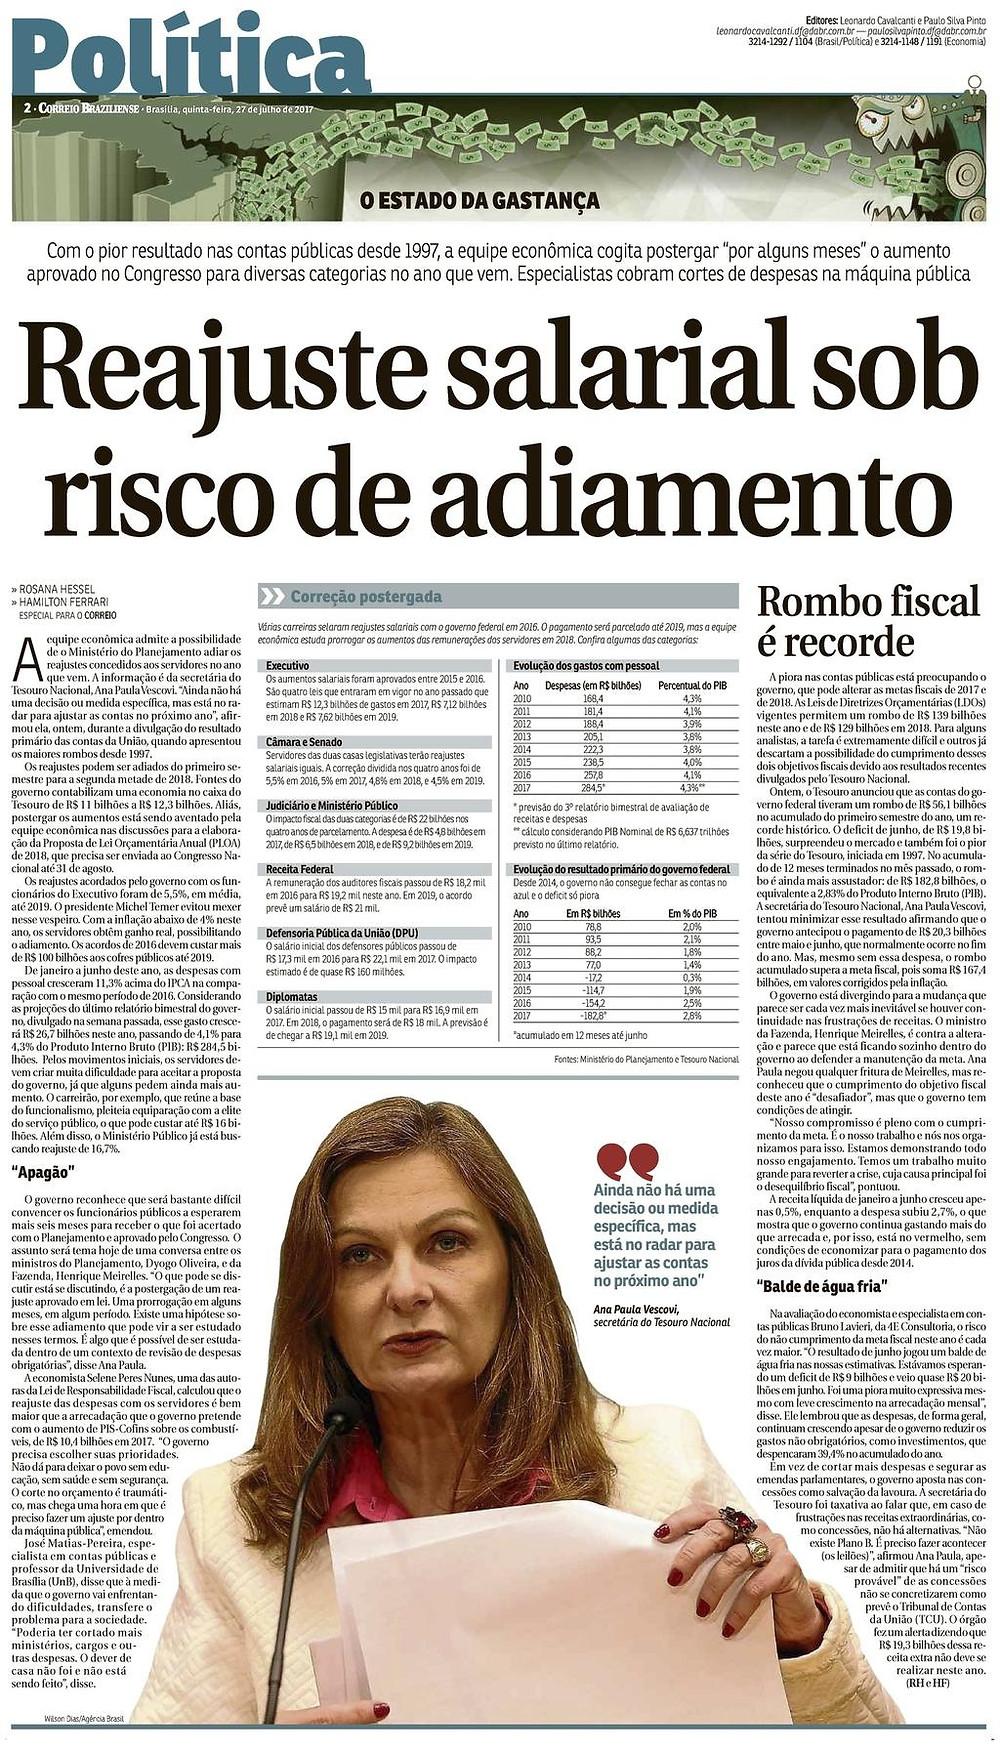 Reajuste salarial sob risco de adiamento - Correio Braziliense